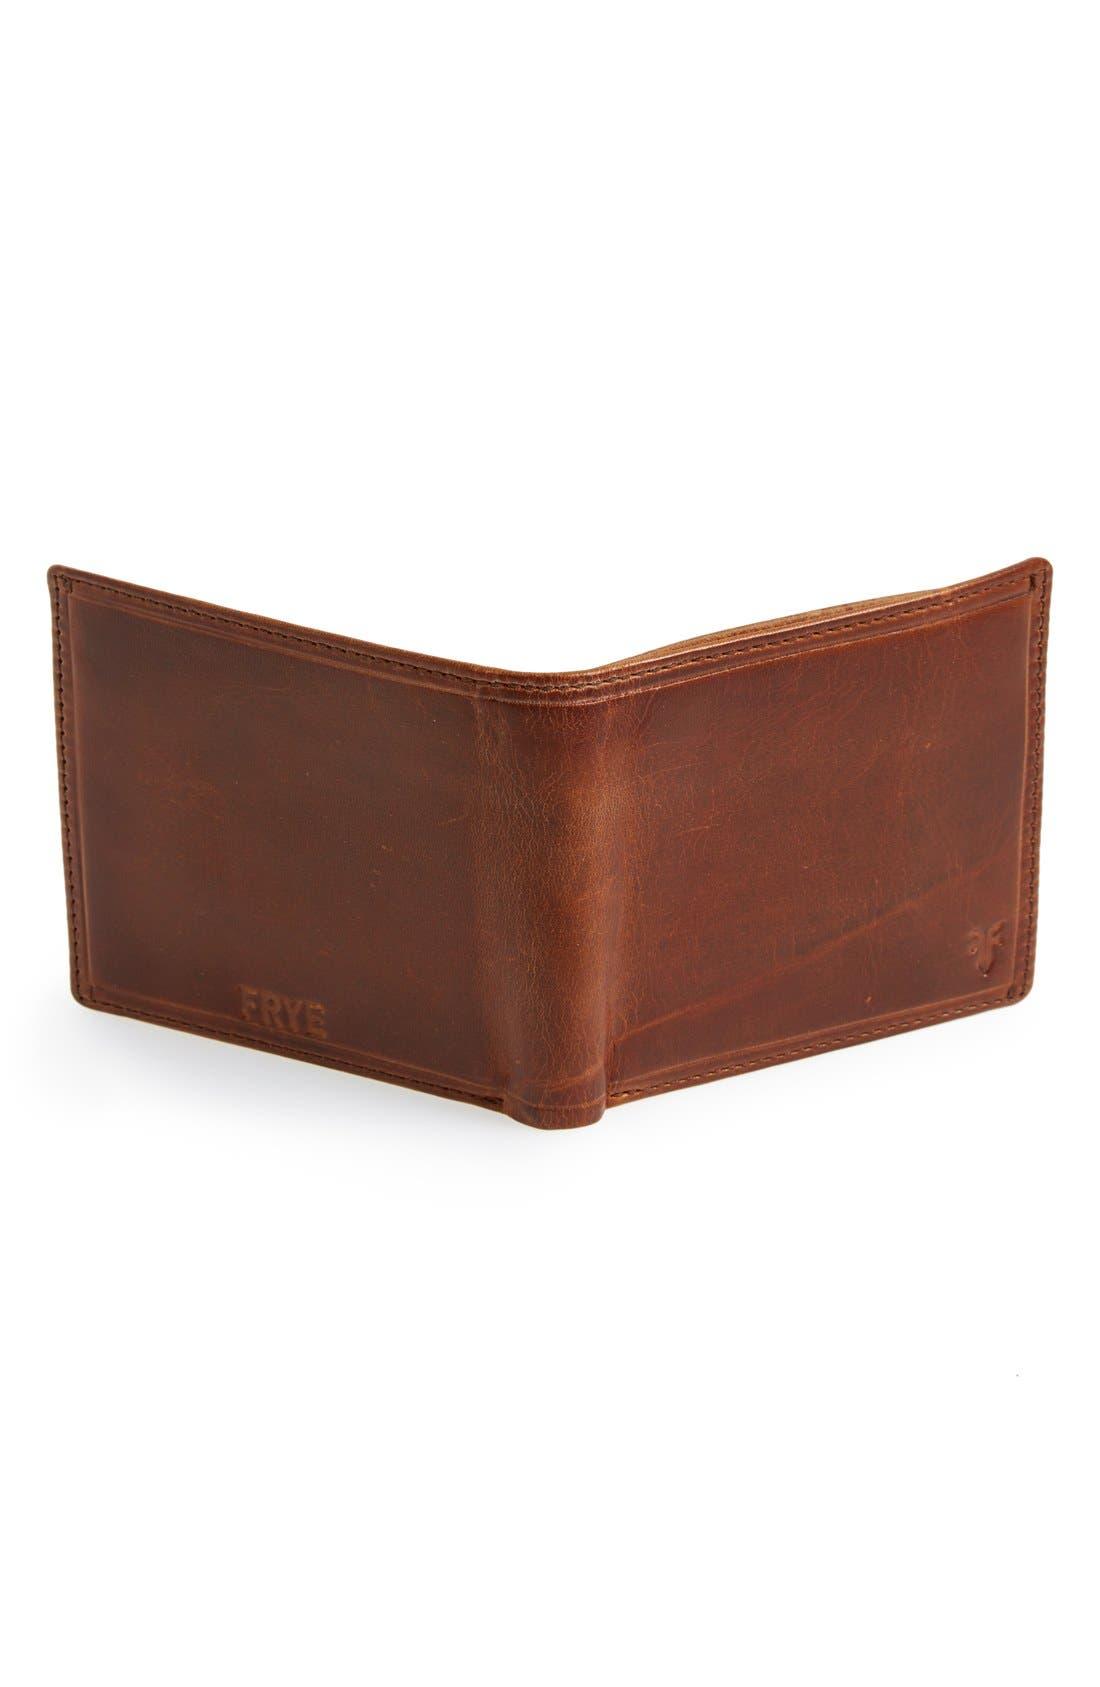 FRYE, 'Logan' Leather Billfold Wallet, Alternate thumbnail 3, color, COGNAC